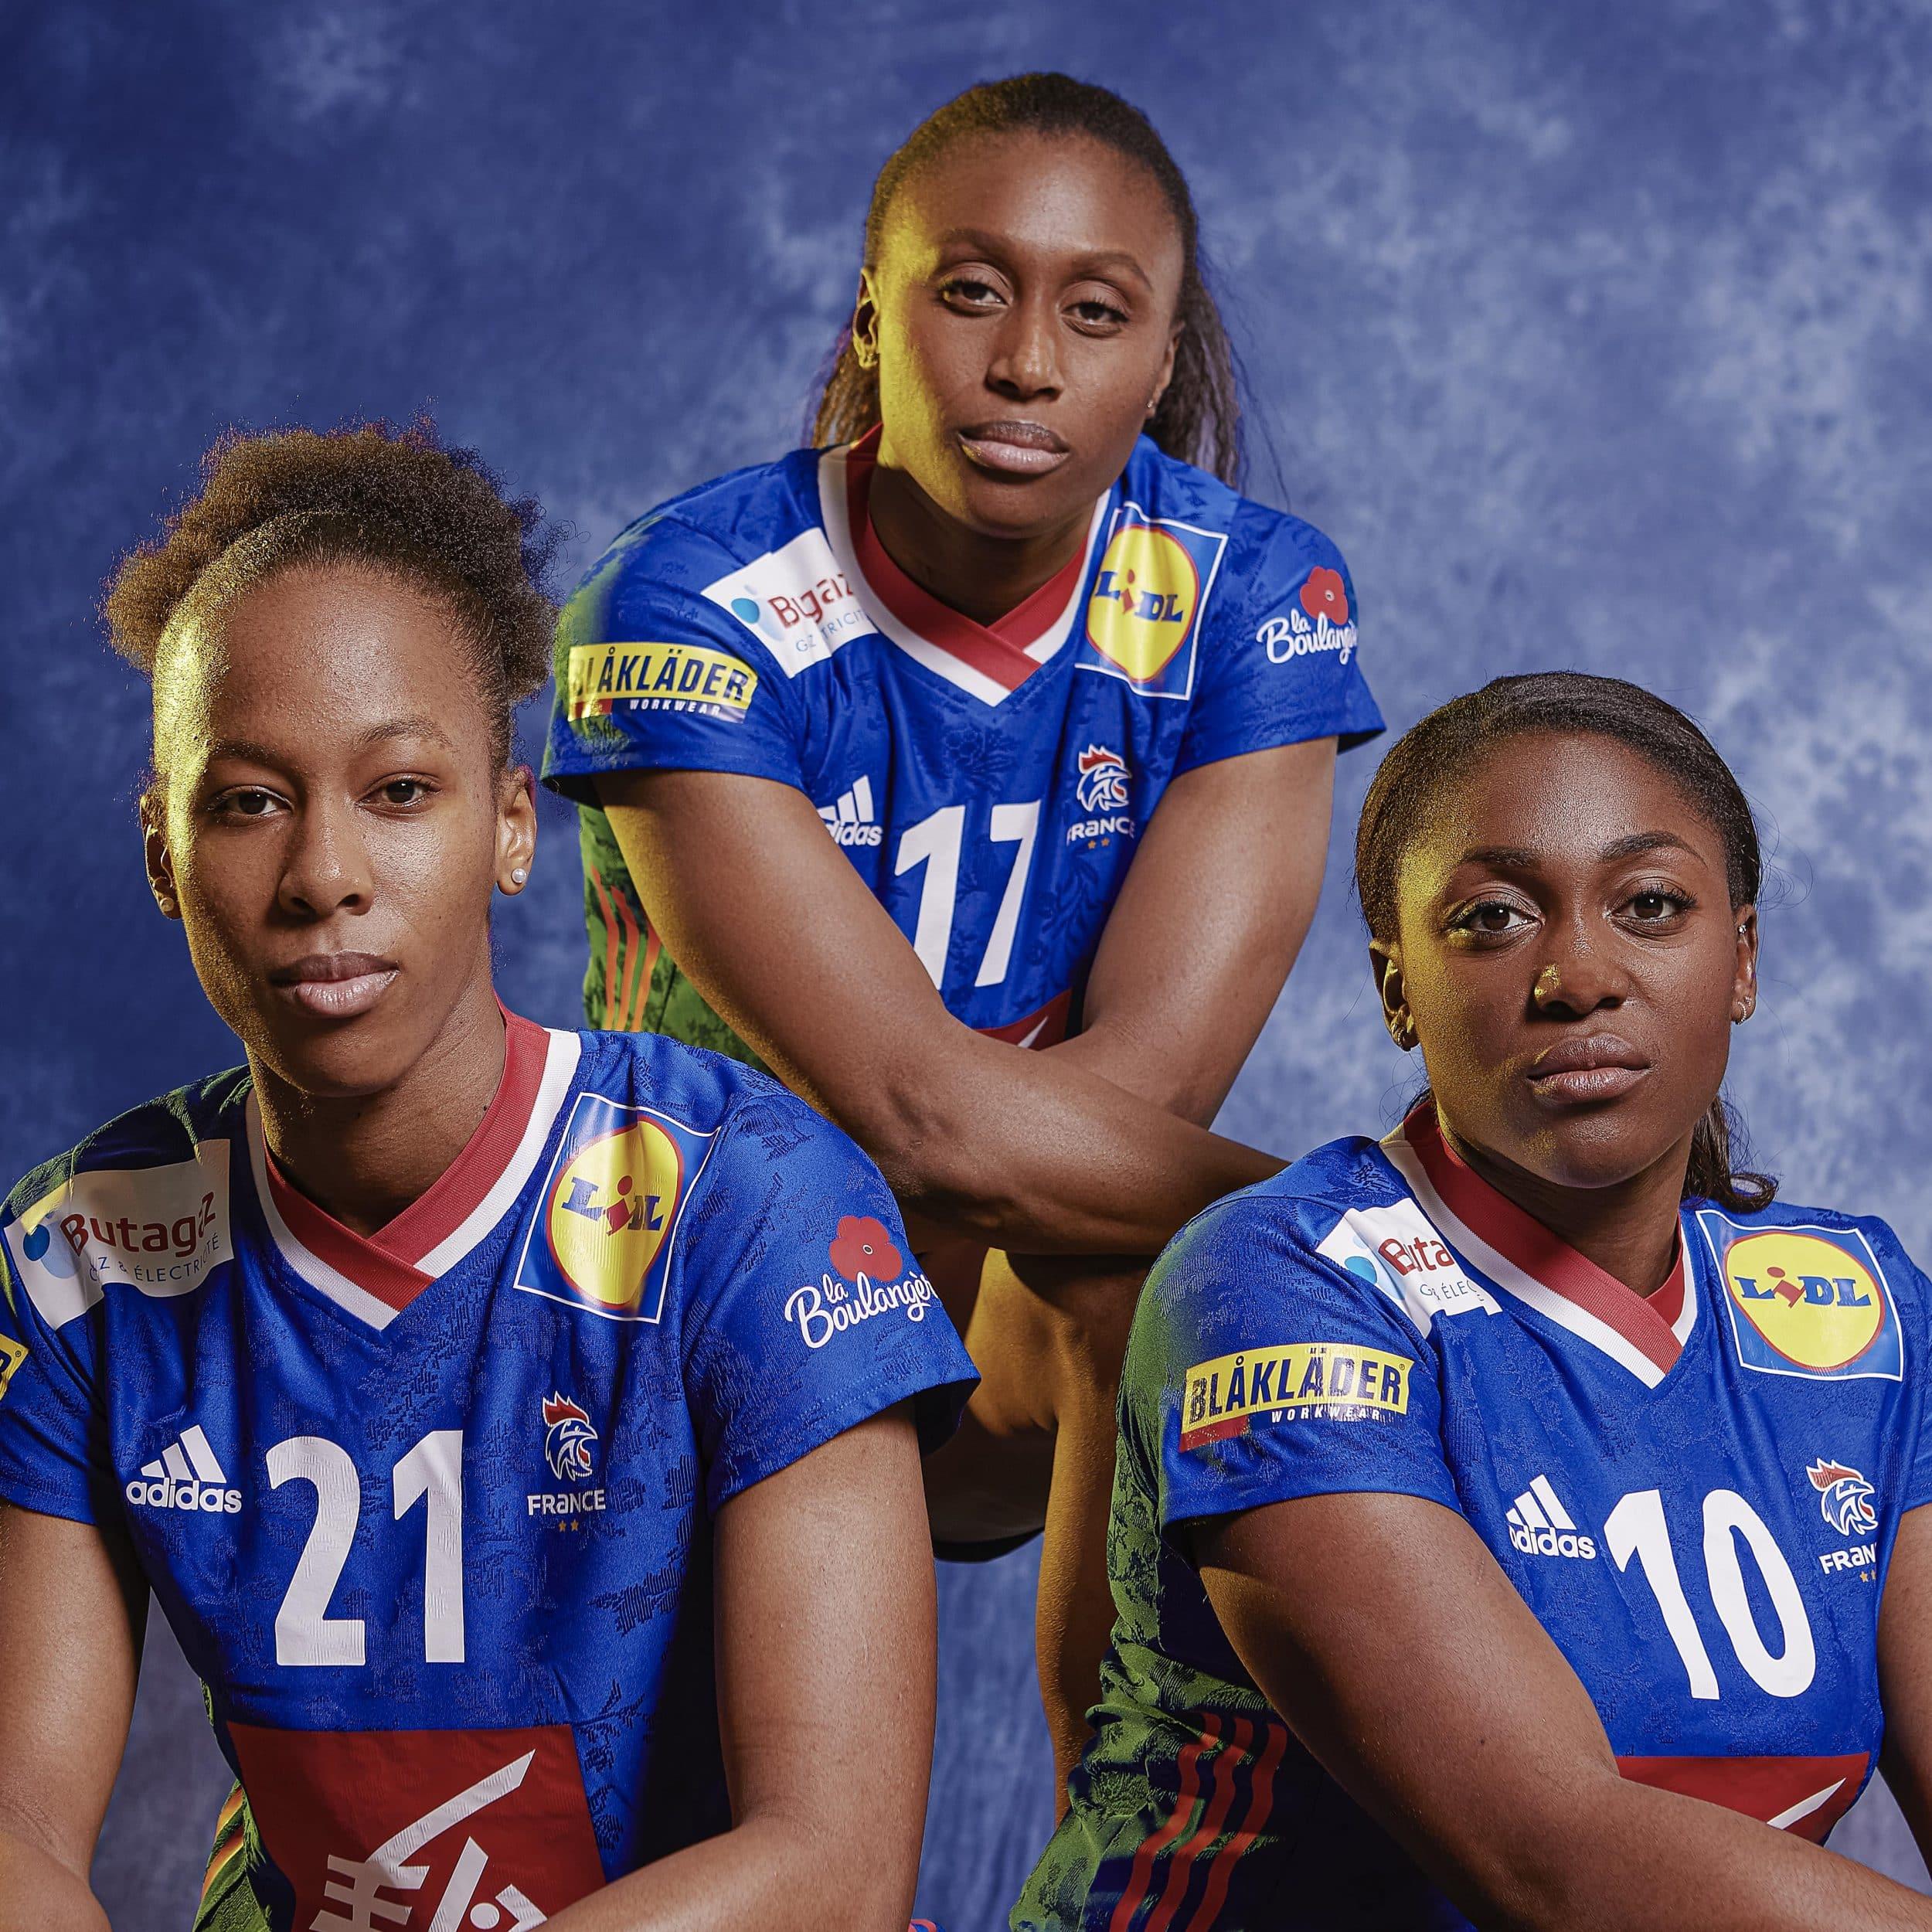 Maillot-équipe-de-france-handball